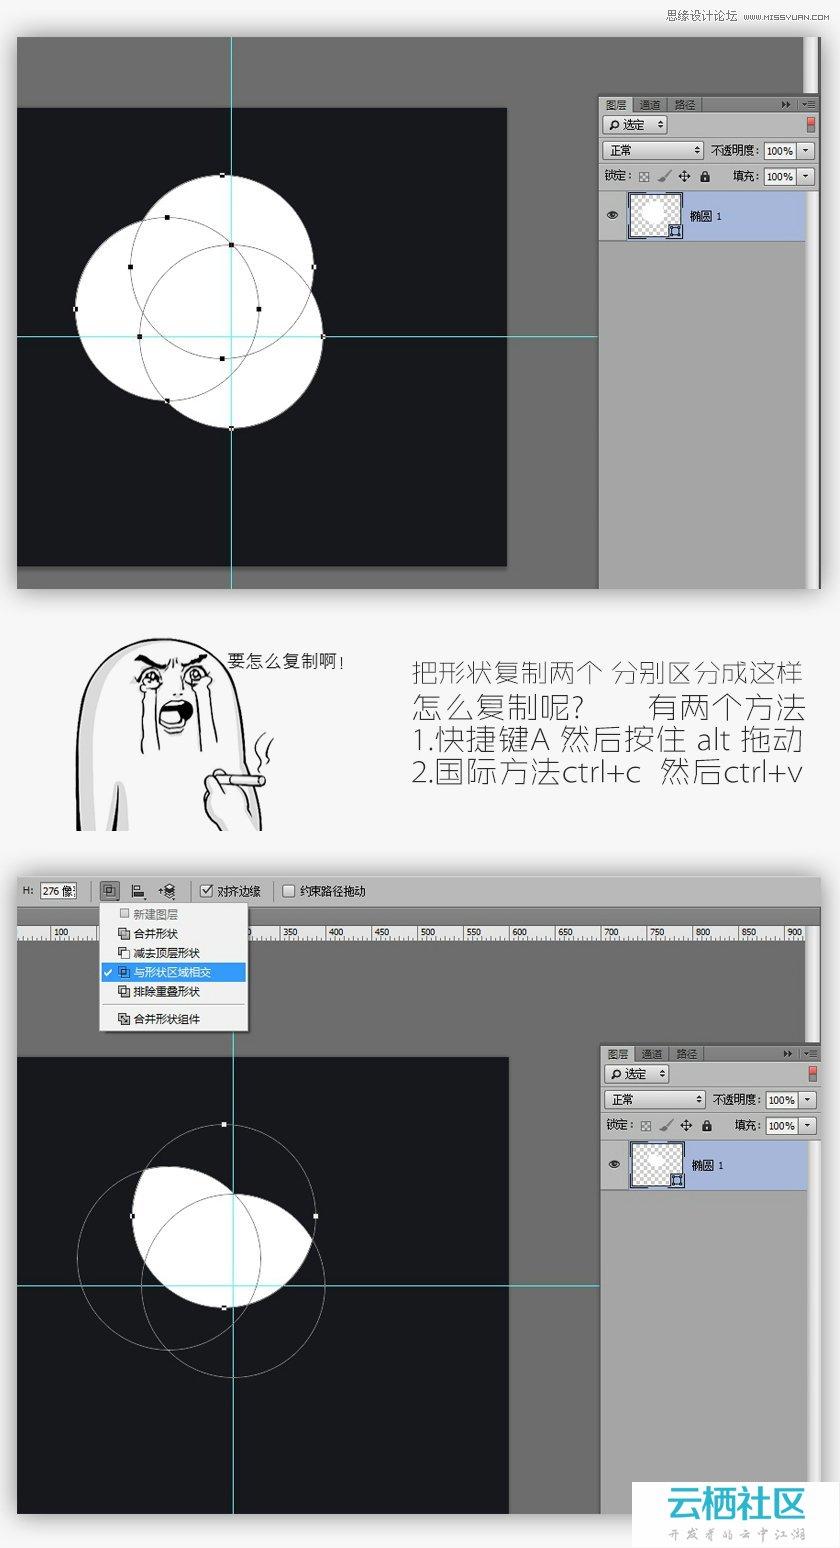 Photoshop绘制立体风格的快门镜头图标-photoshop绘制平面图